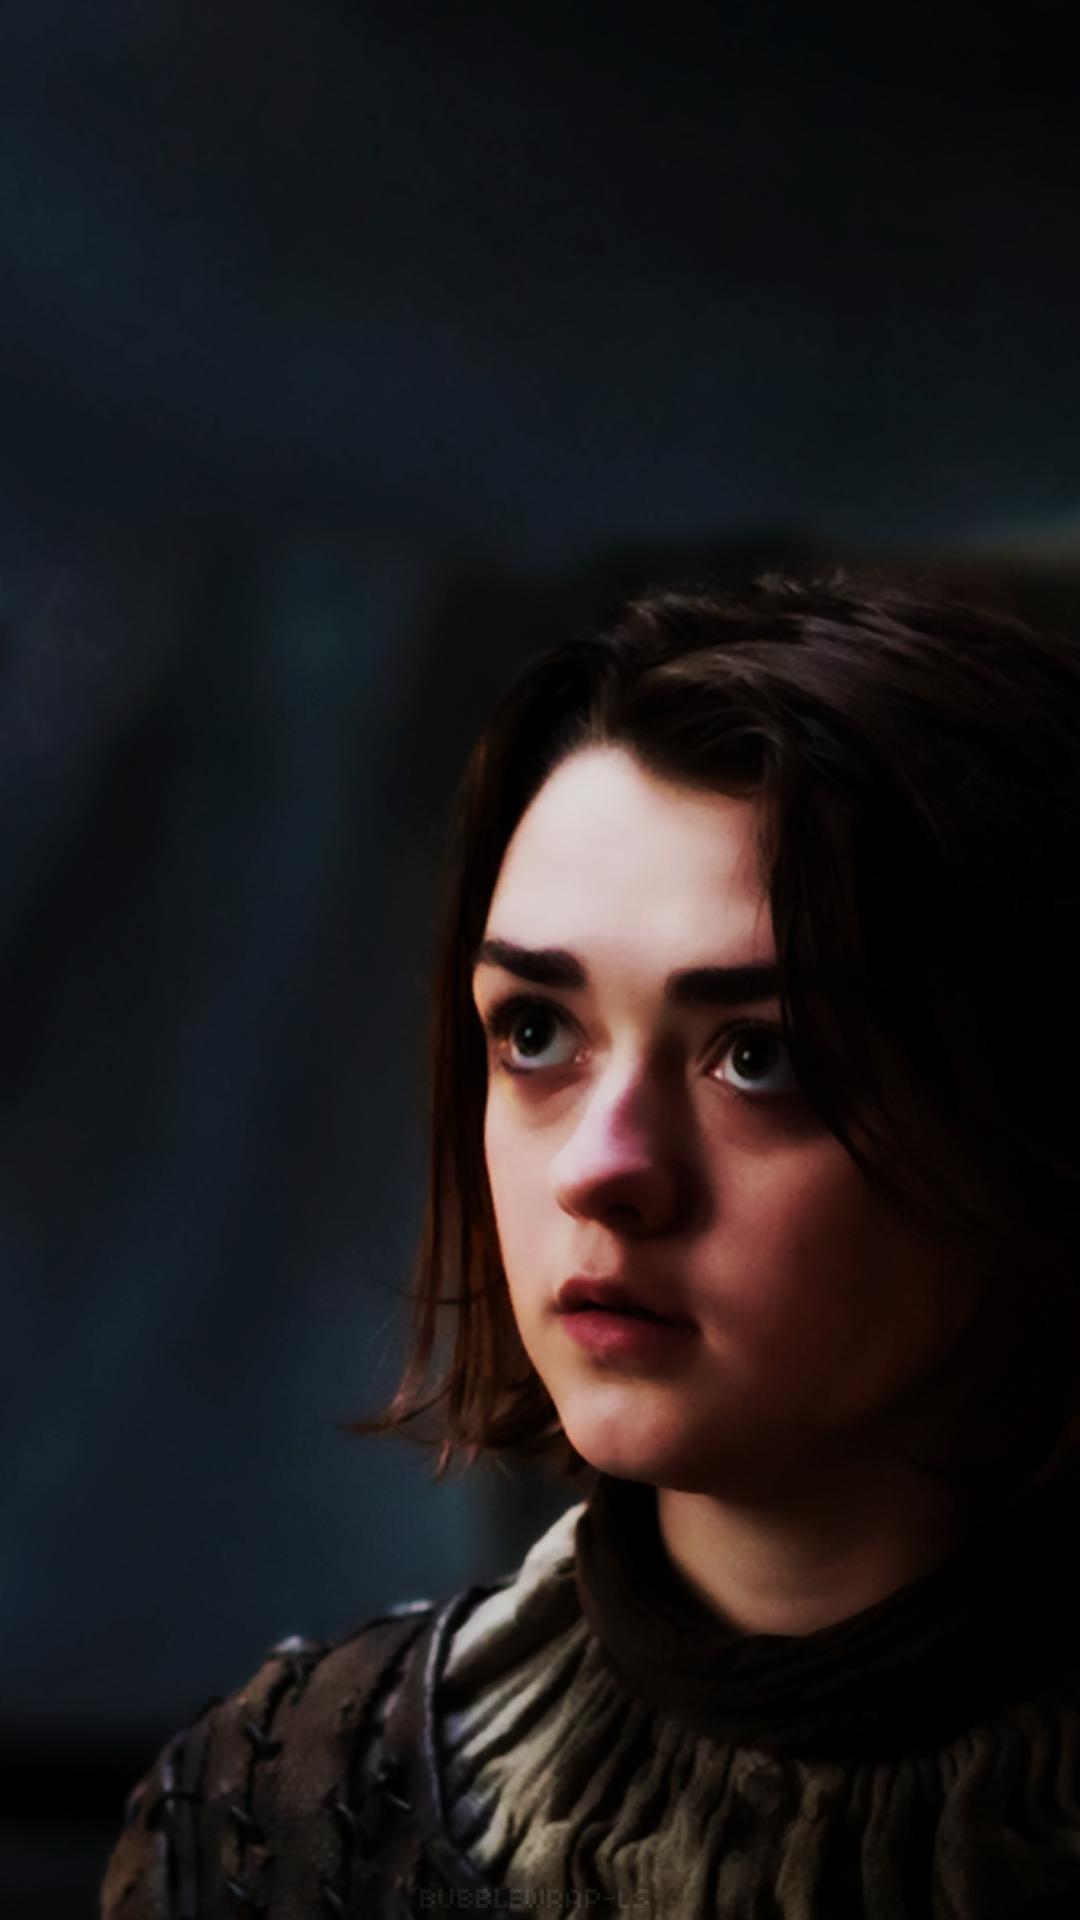 Arya Stark Iphone Wallpaper Wide Is 4k Wallpaper Yodobi Arya Stark Arya Stark Wallpaper Arya